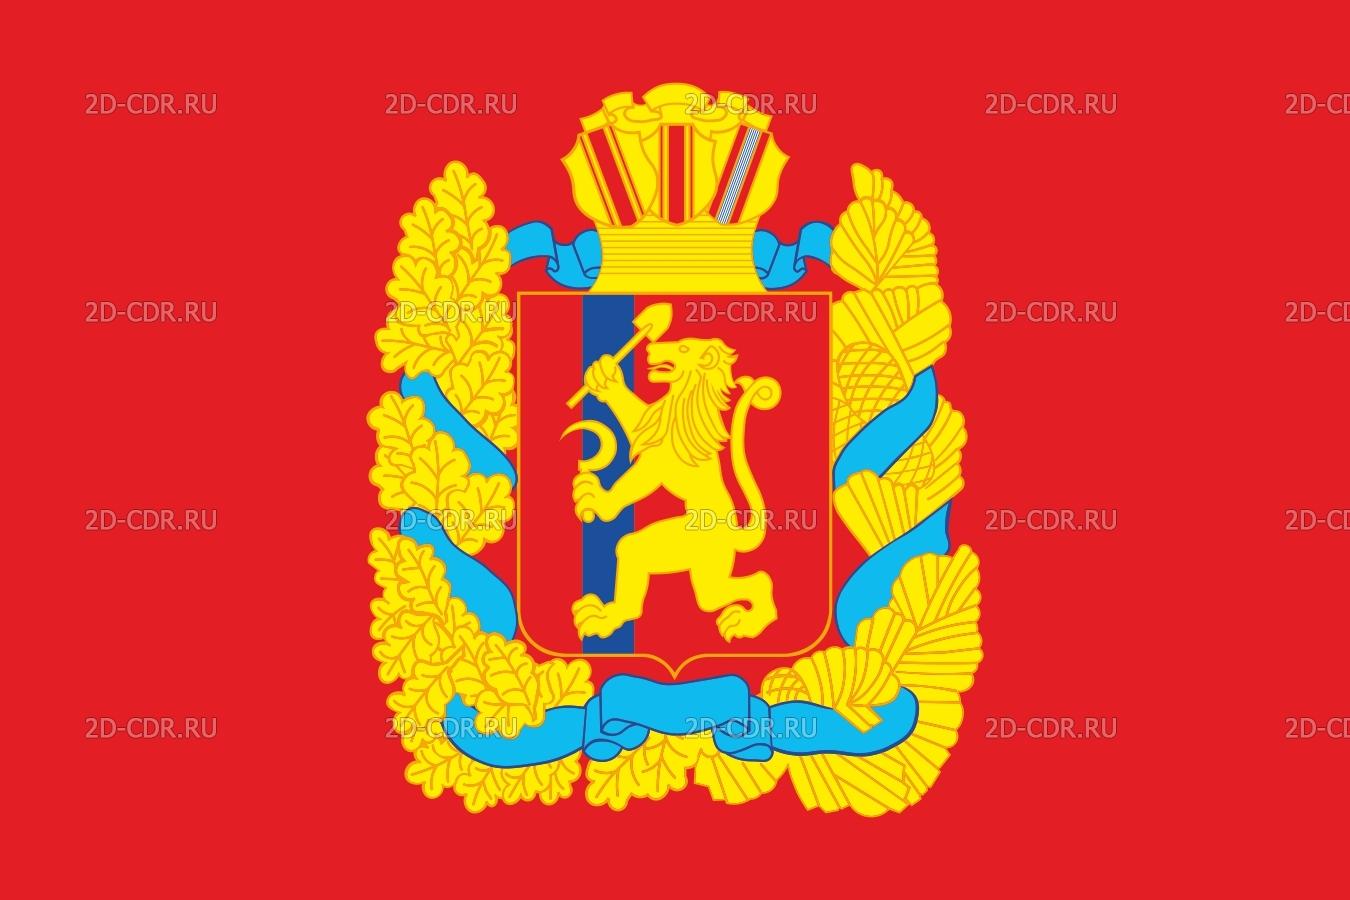 ретро-платья, флаг красноярска картинка транспорт